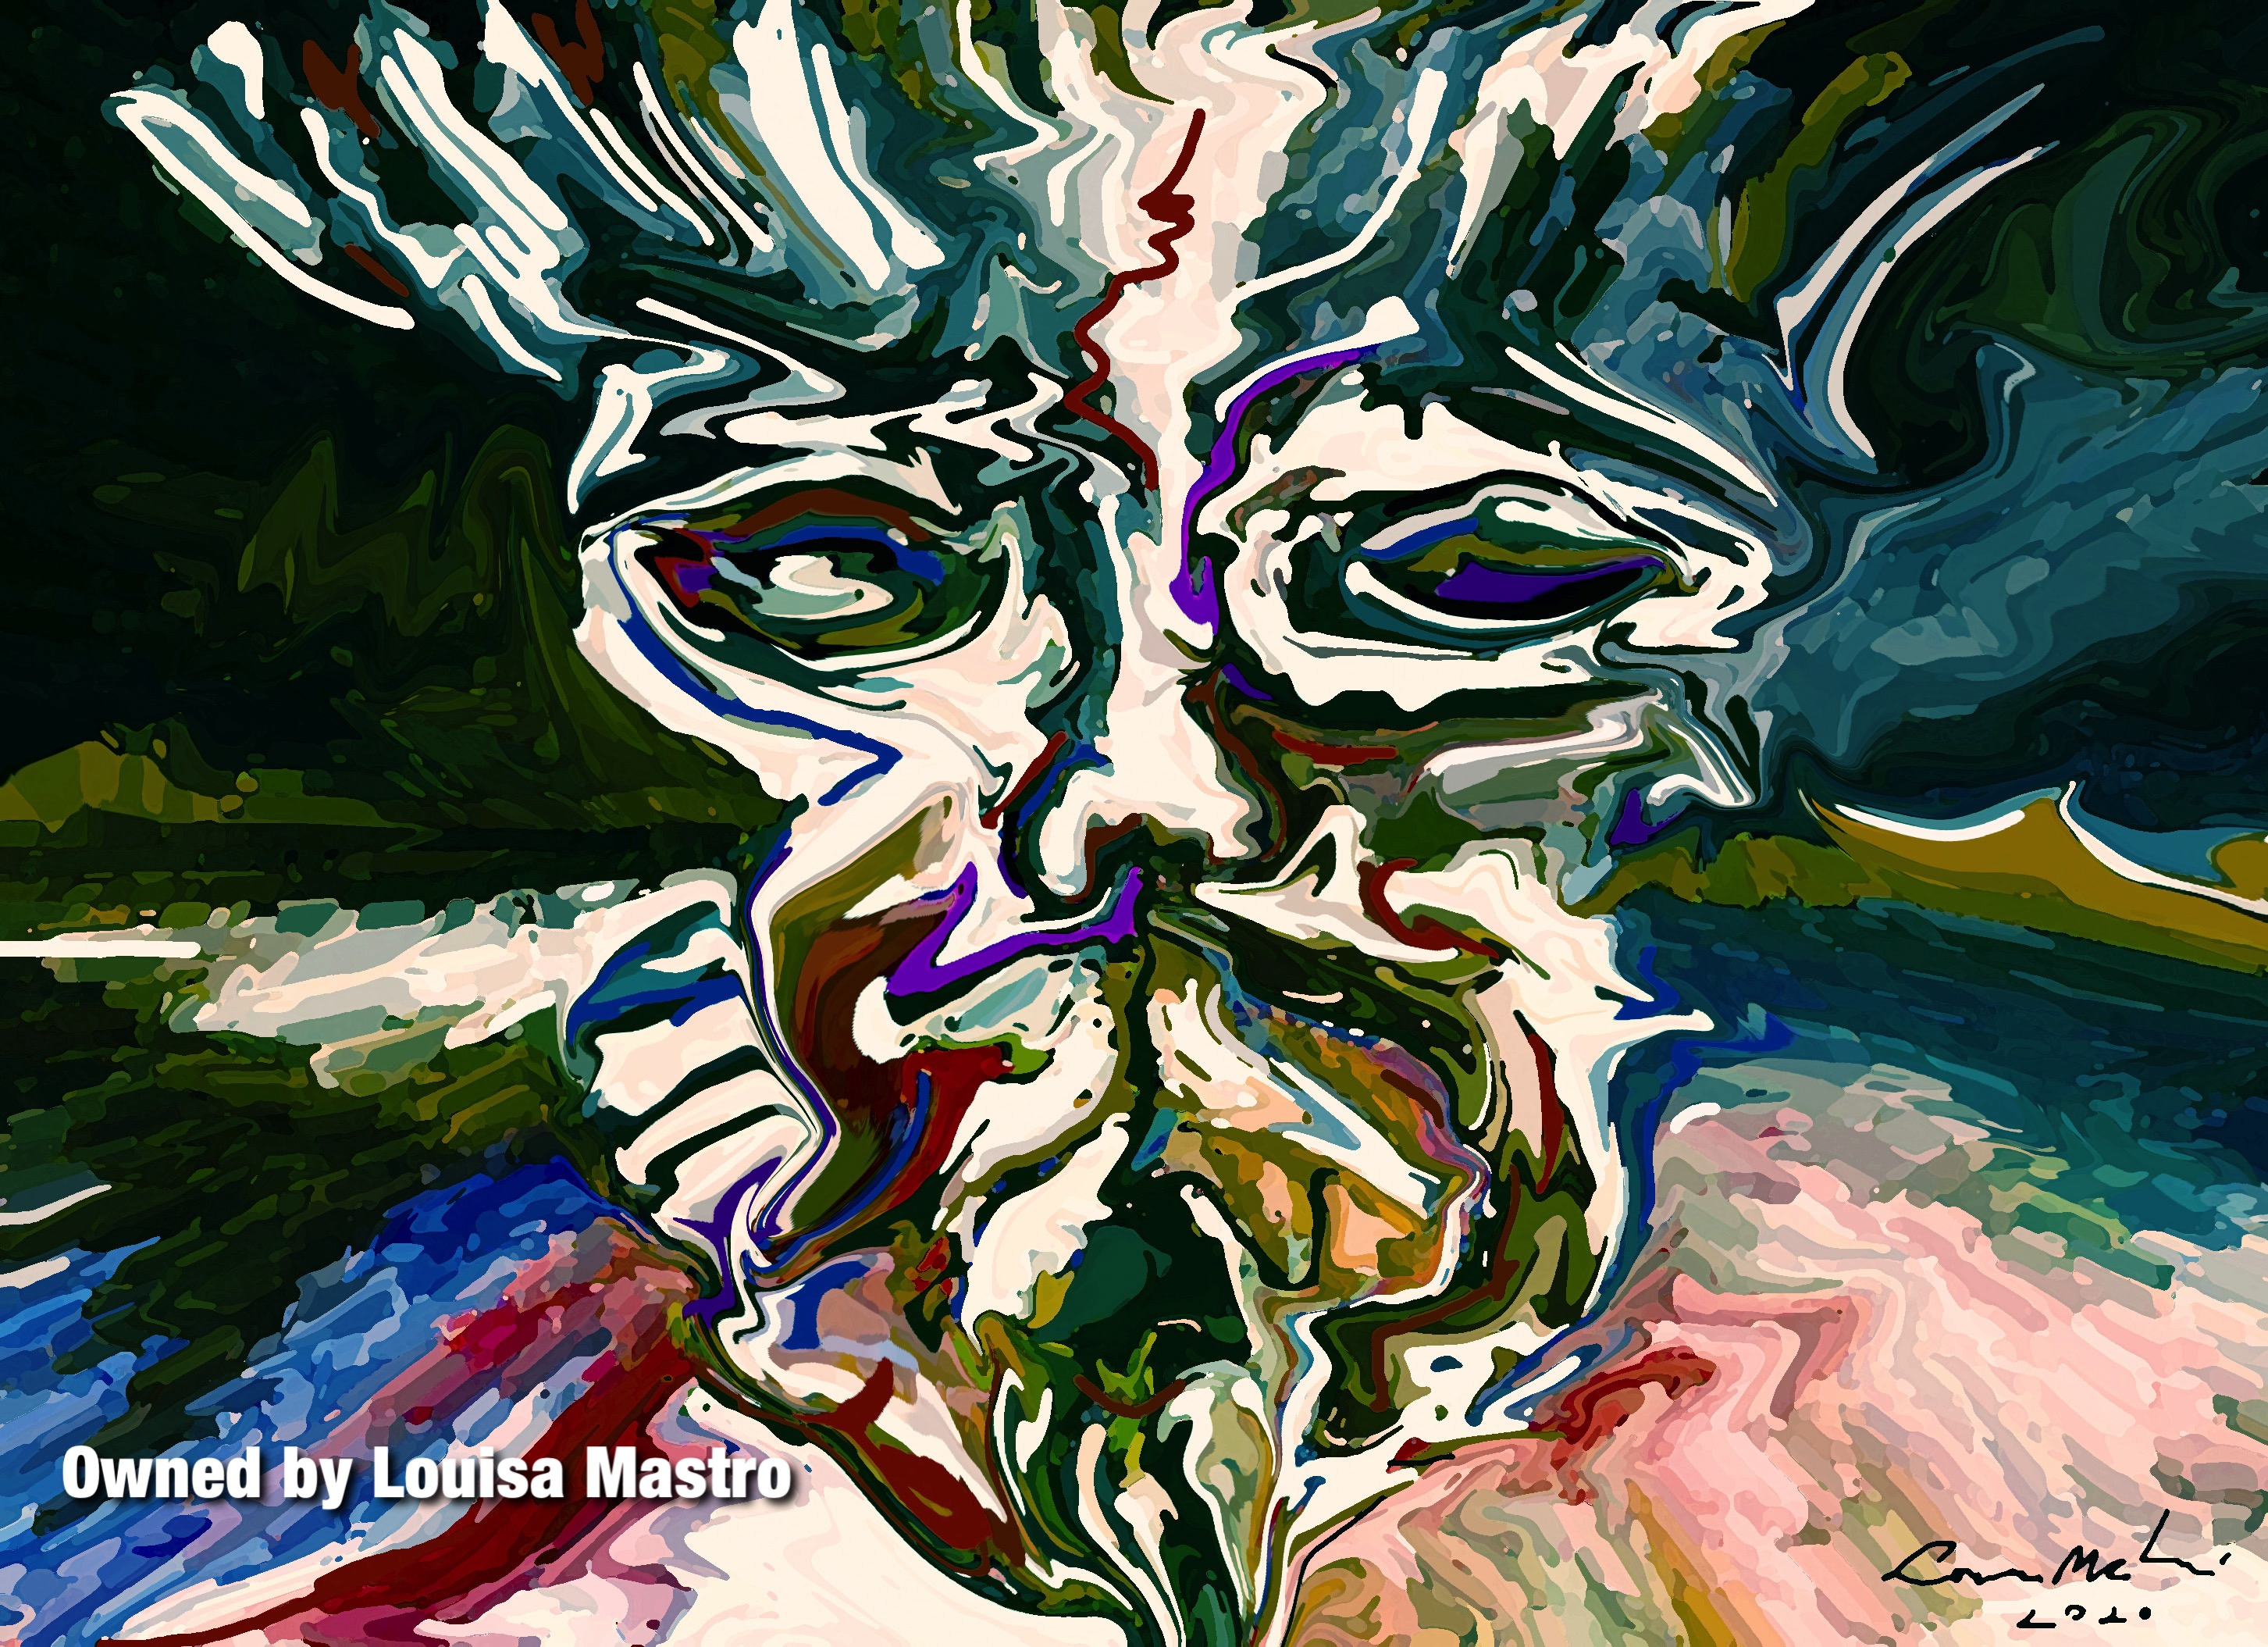 Martyr Clown (c) Louisa Mastro